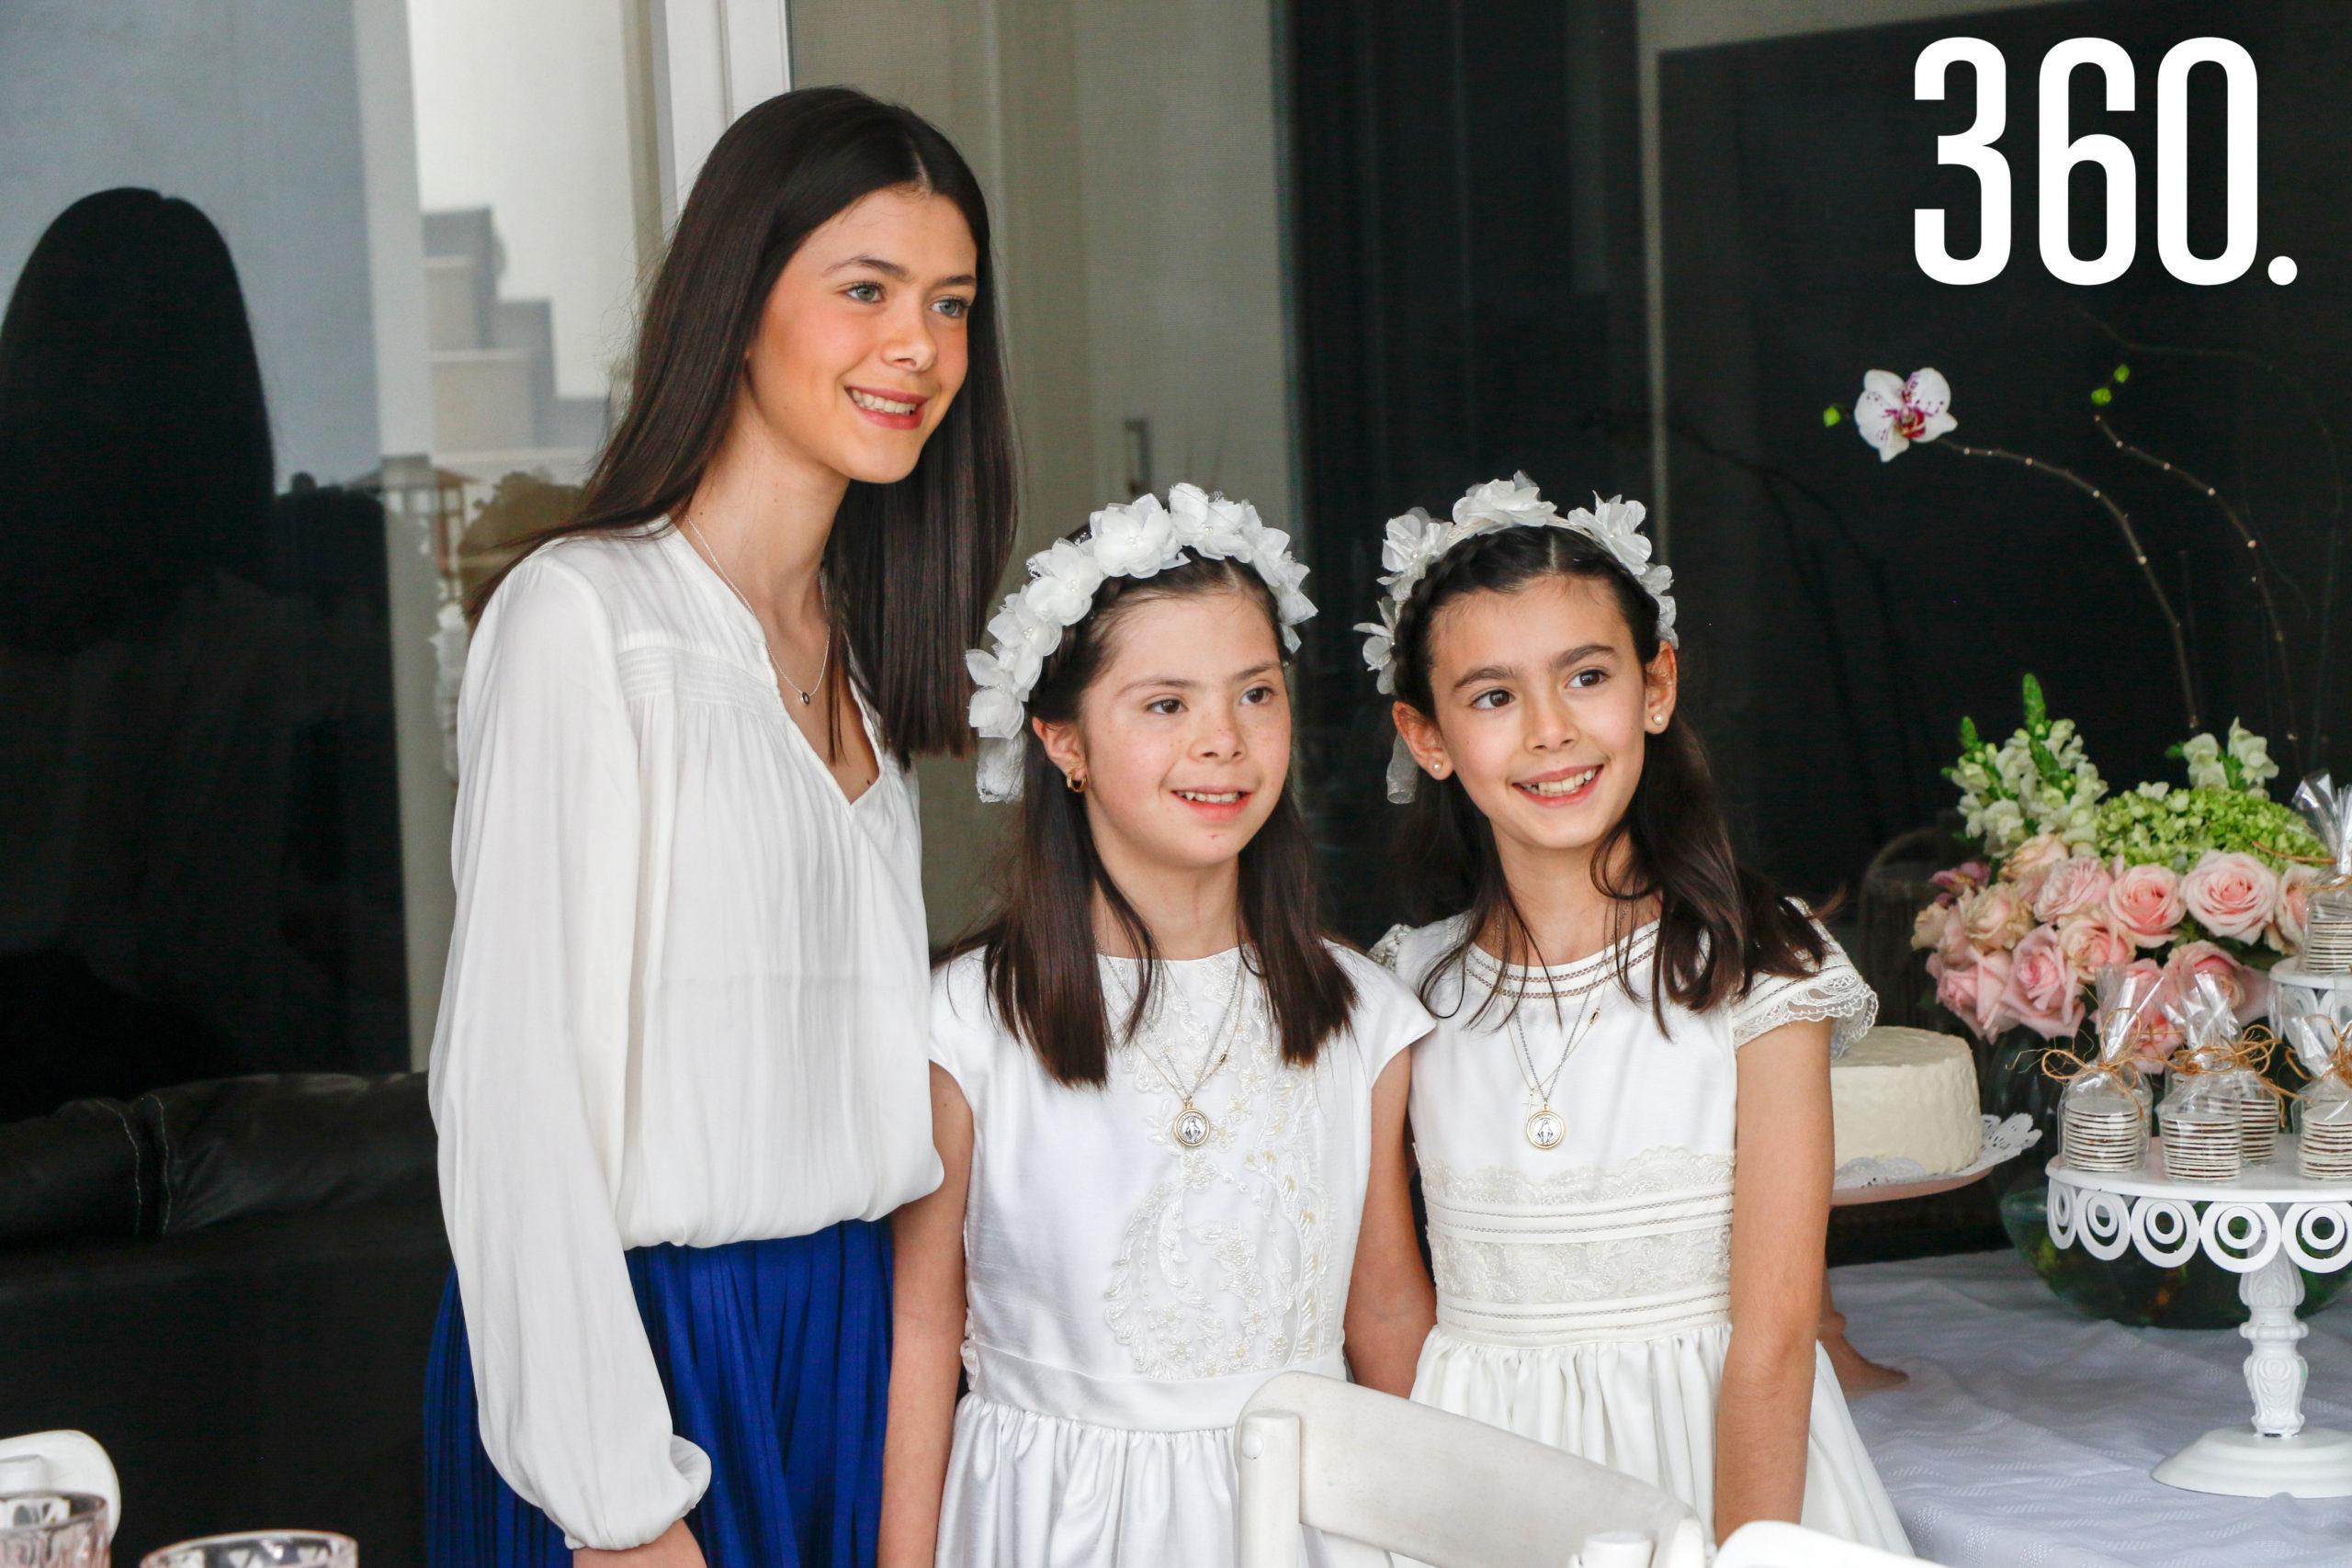 Natalia y Bárbara con su hermana, Jimena Basáñez.